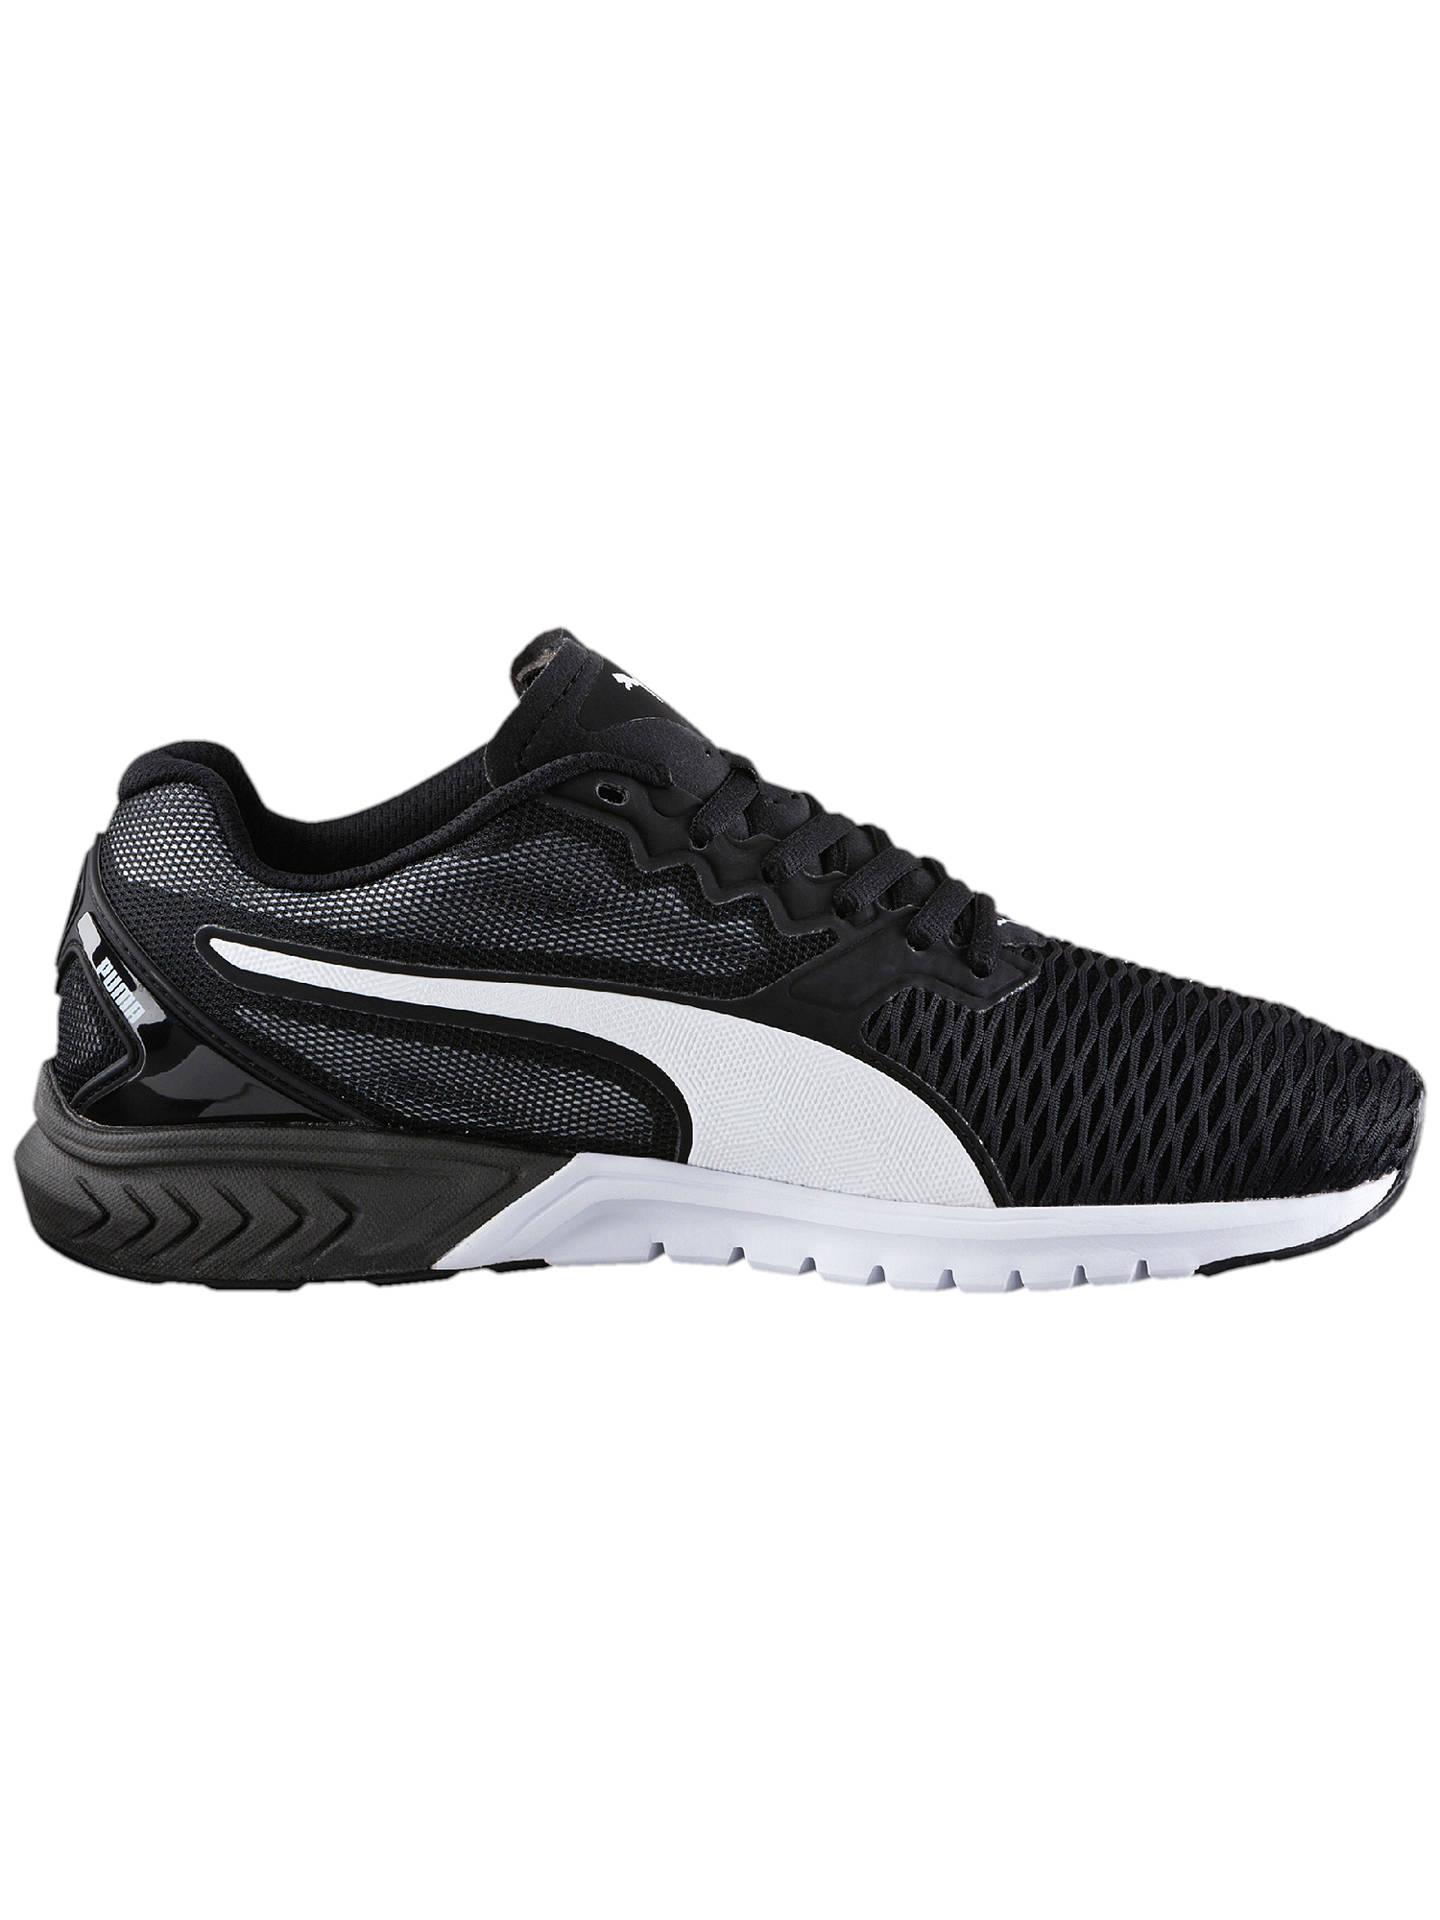 968c4eda70e BuyPuma Ignite Dual Women s Running Shoes